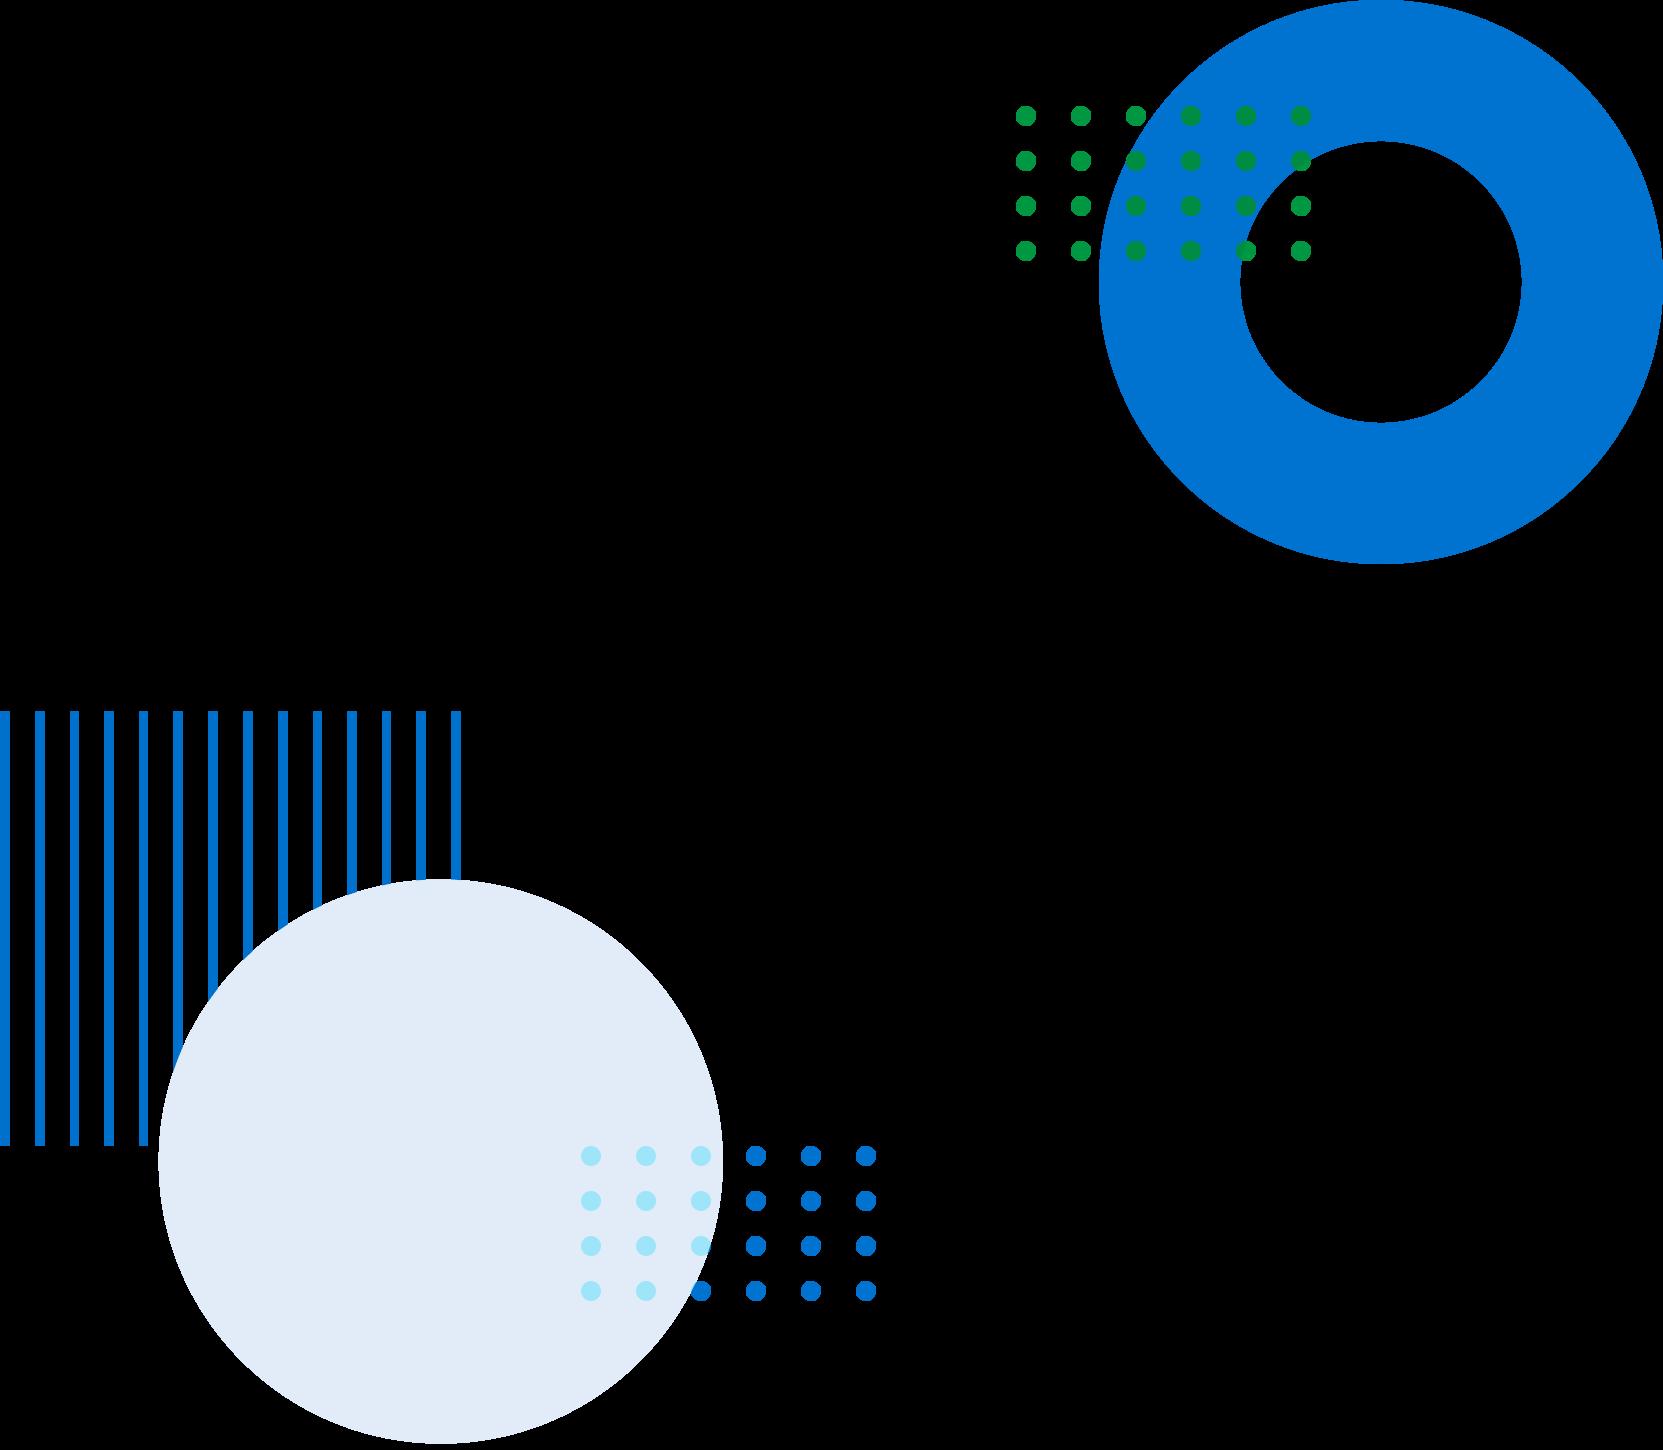 circular and square animated symbols